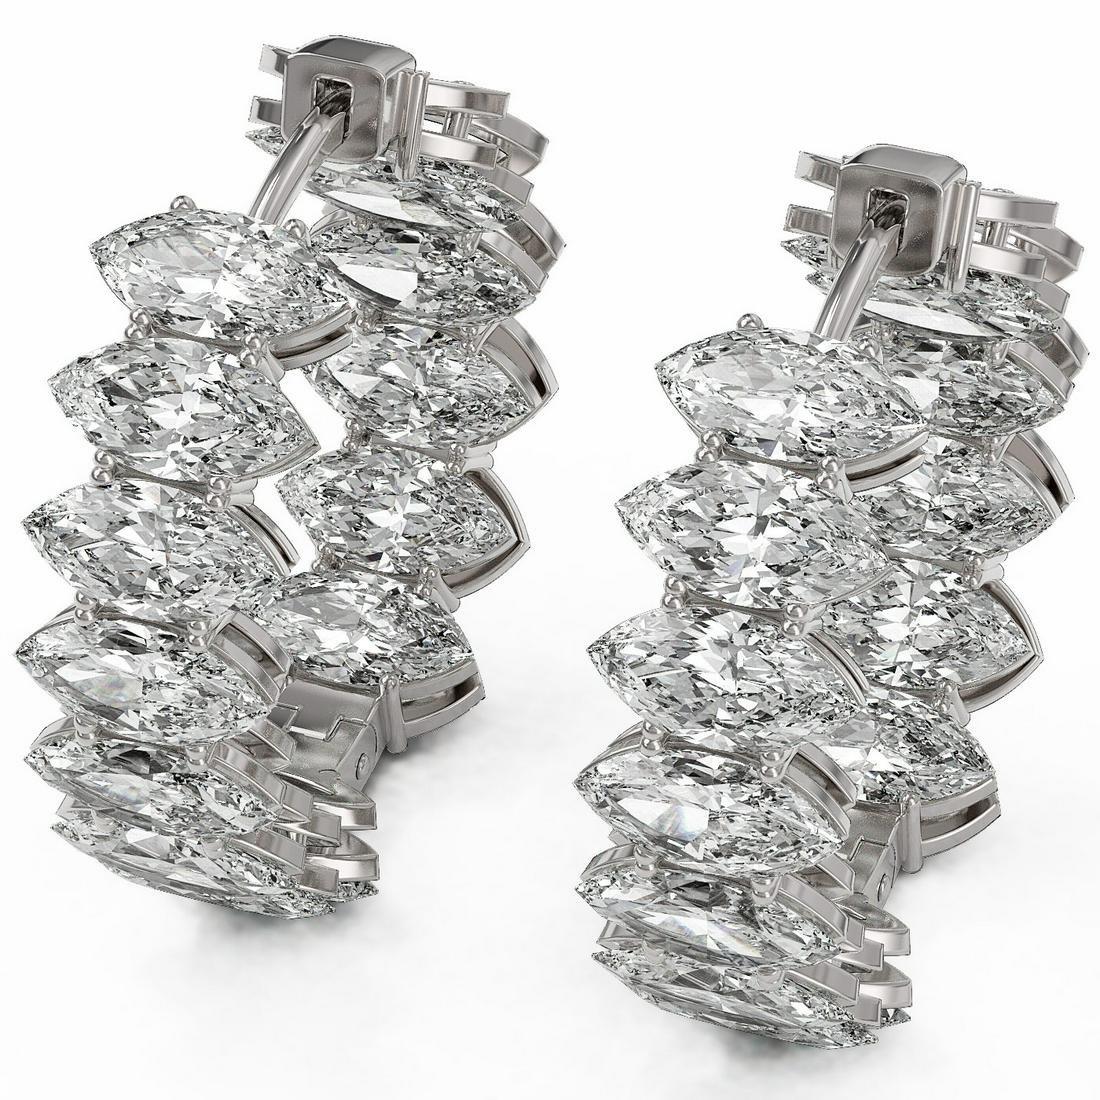 14.28 ctw Marquise Cut Diamond Earrings 18K White Gold